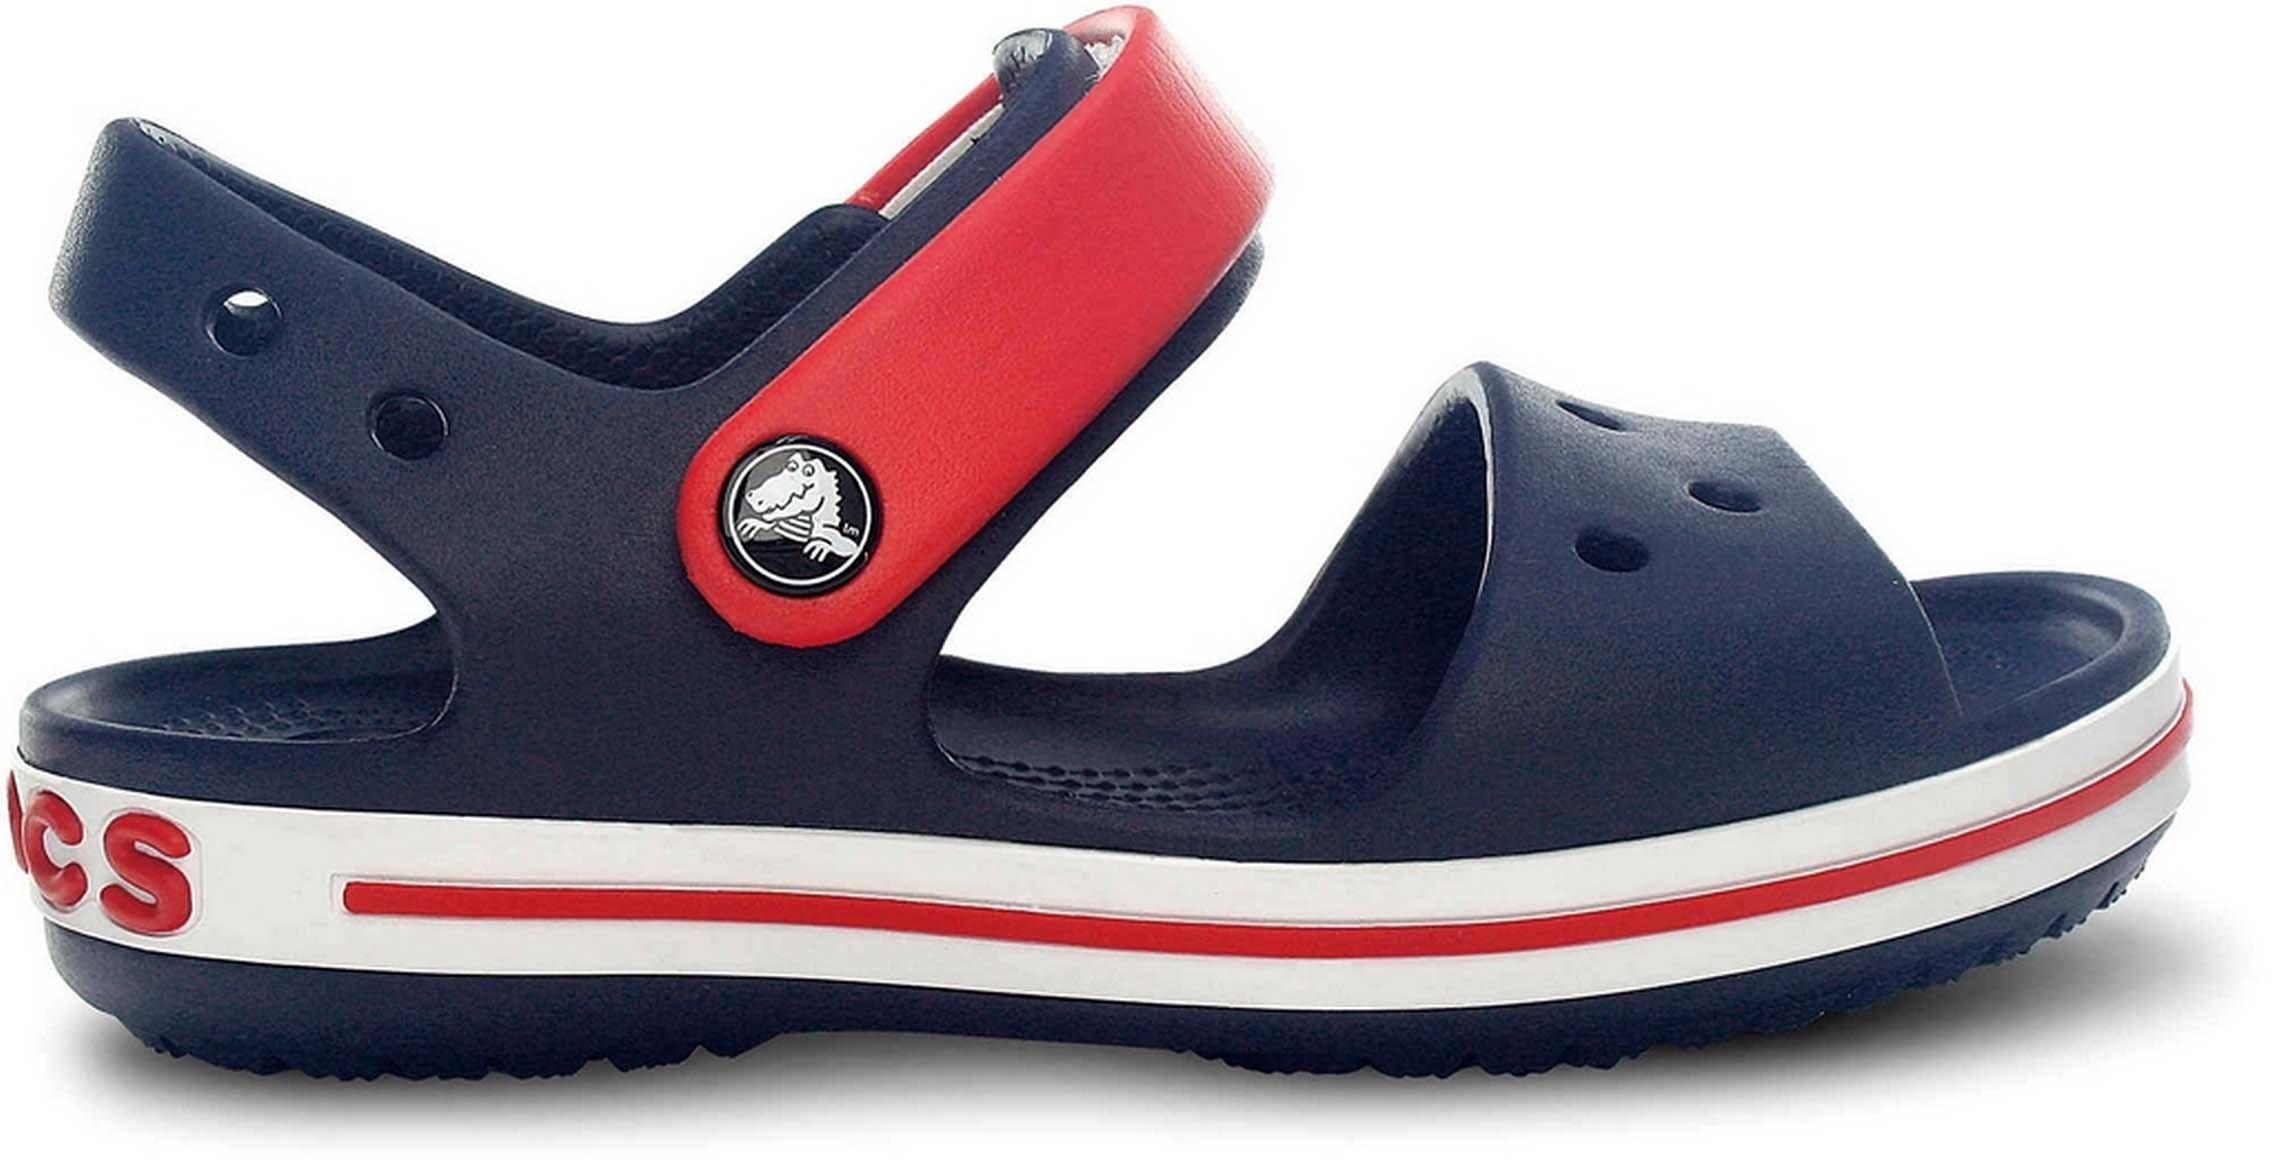 Crocs Crocband Sandal Kids 30 EUR